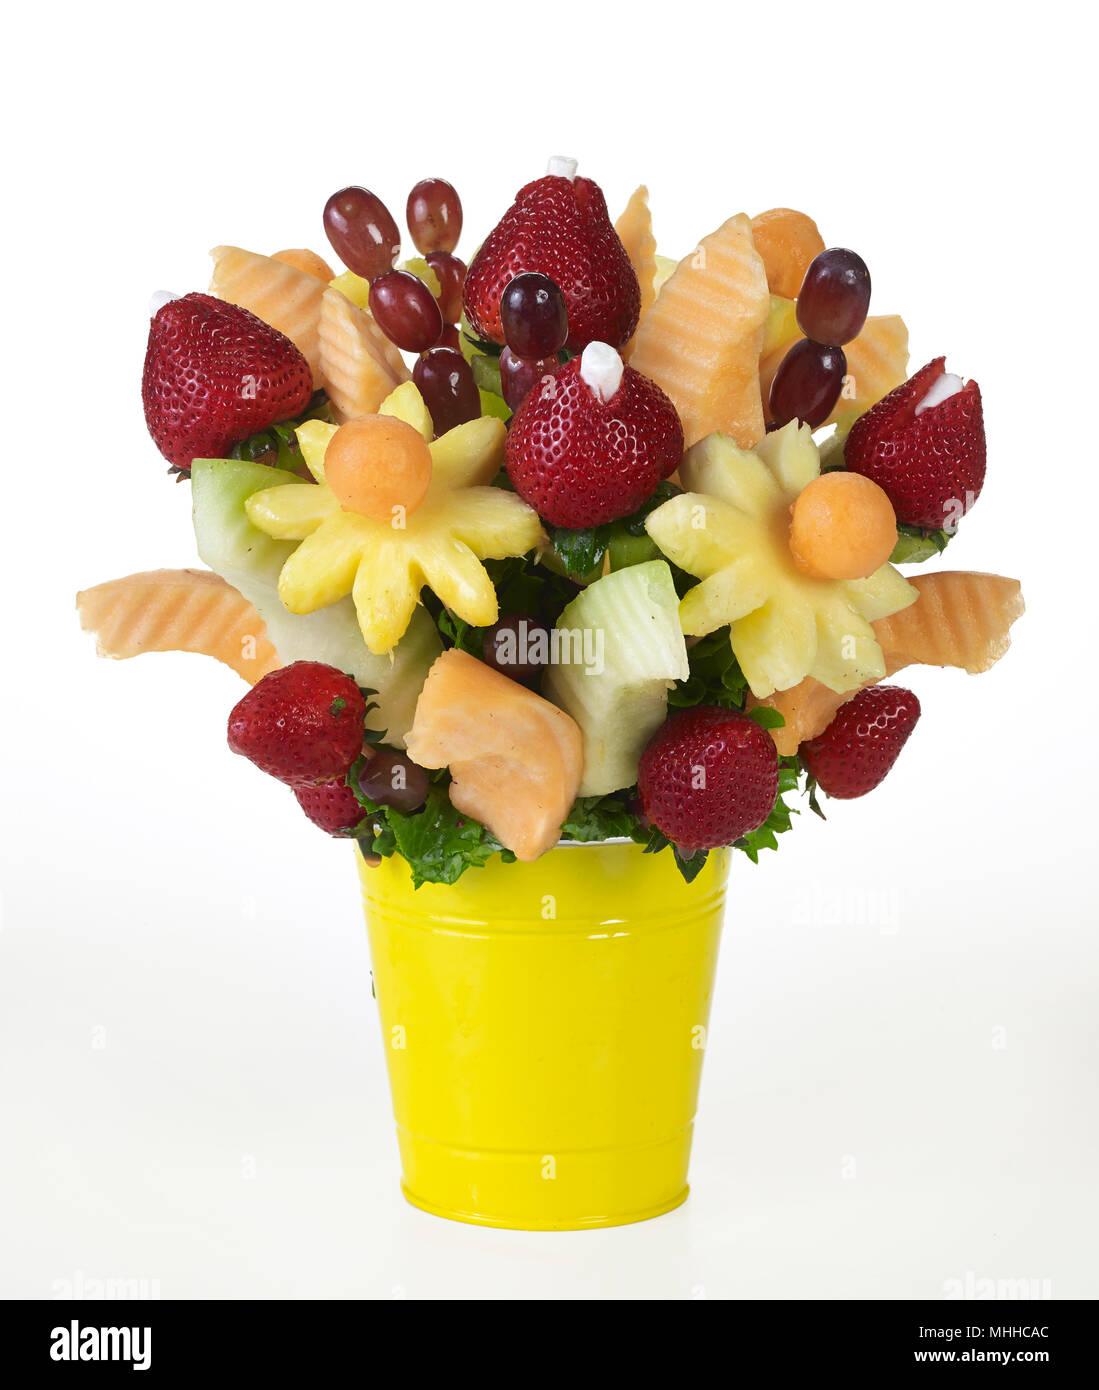 Fruit flowers bouquet stock photo 182935716 alamy fruit flowers bouquet izmirmasajfo